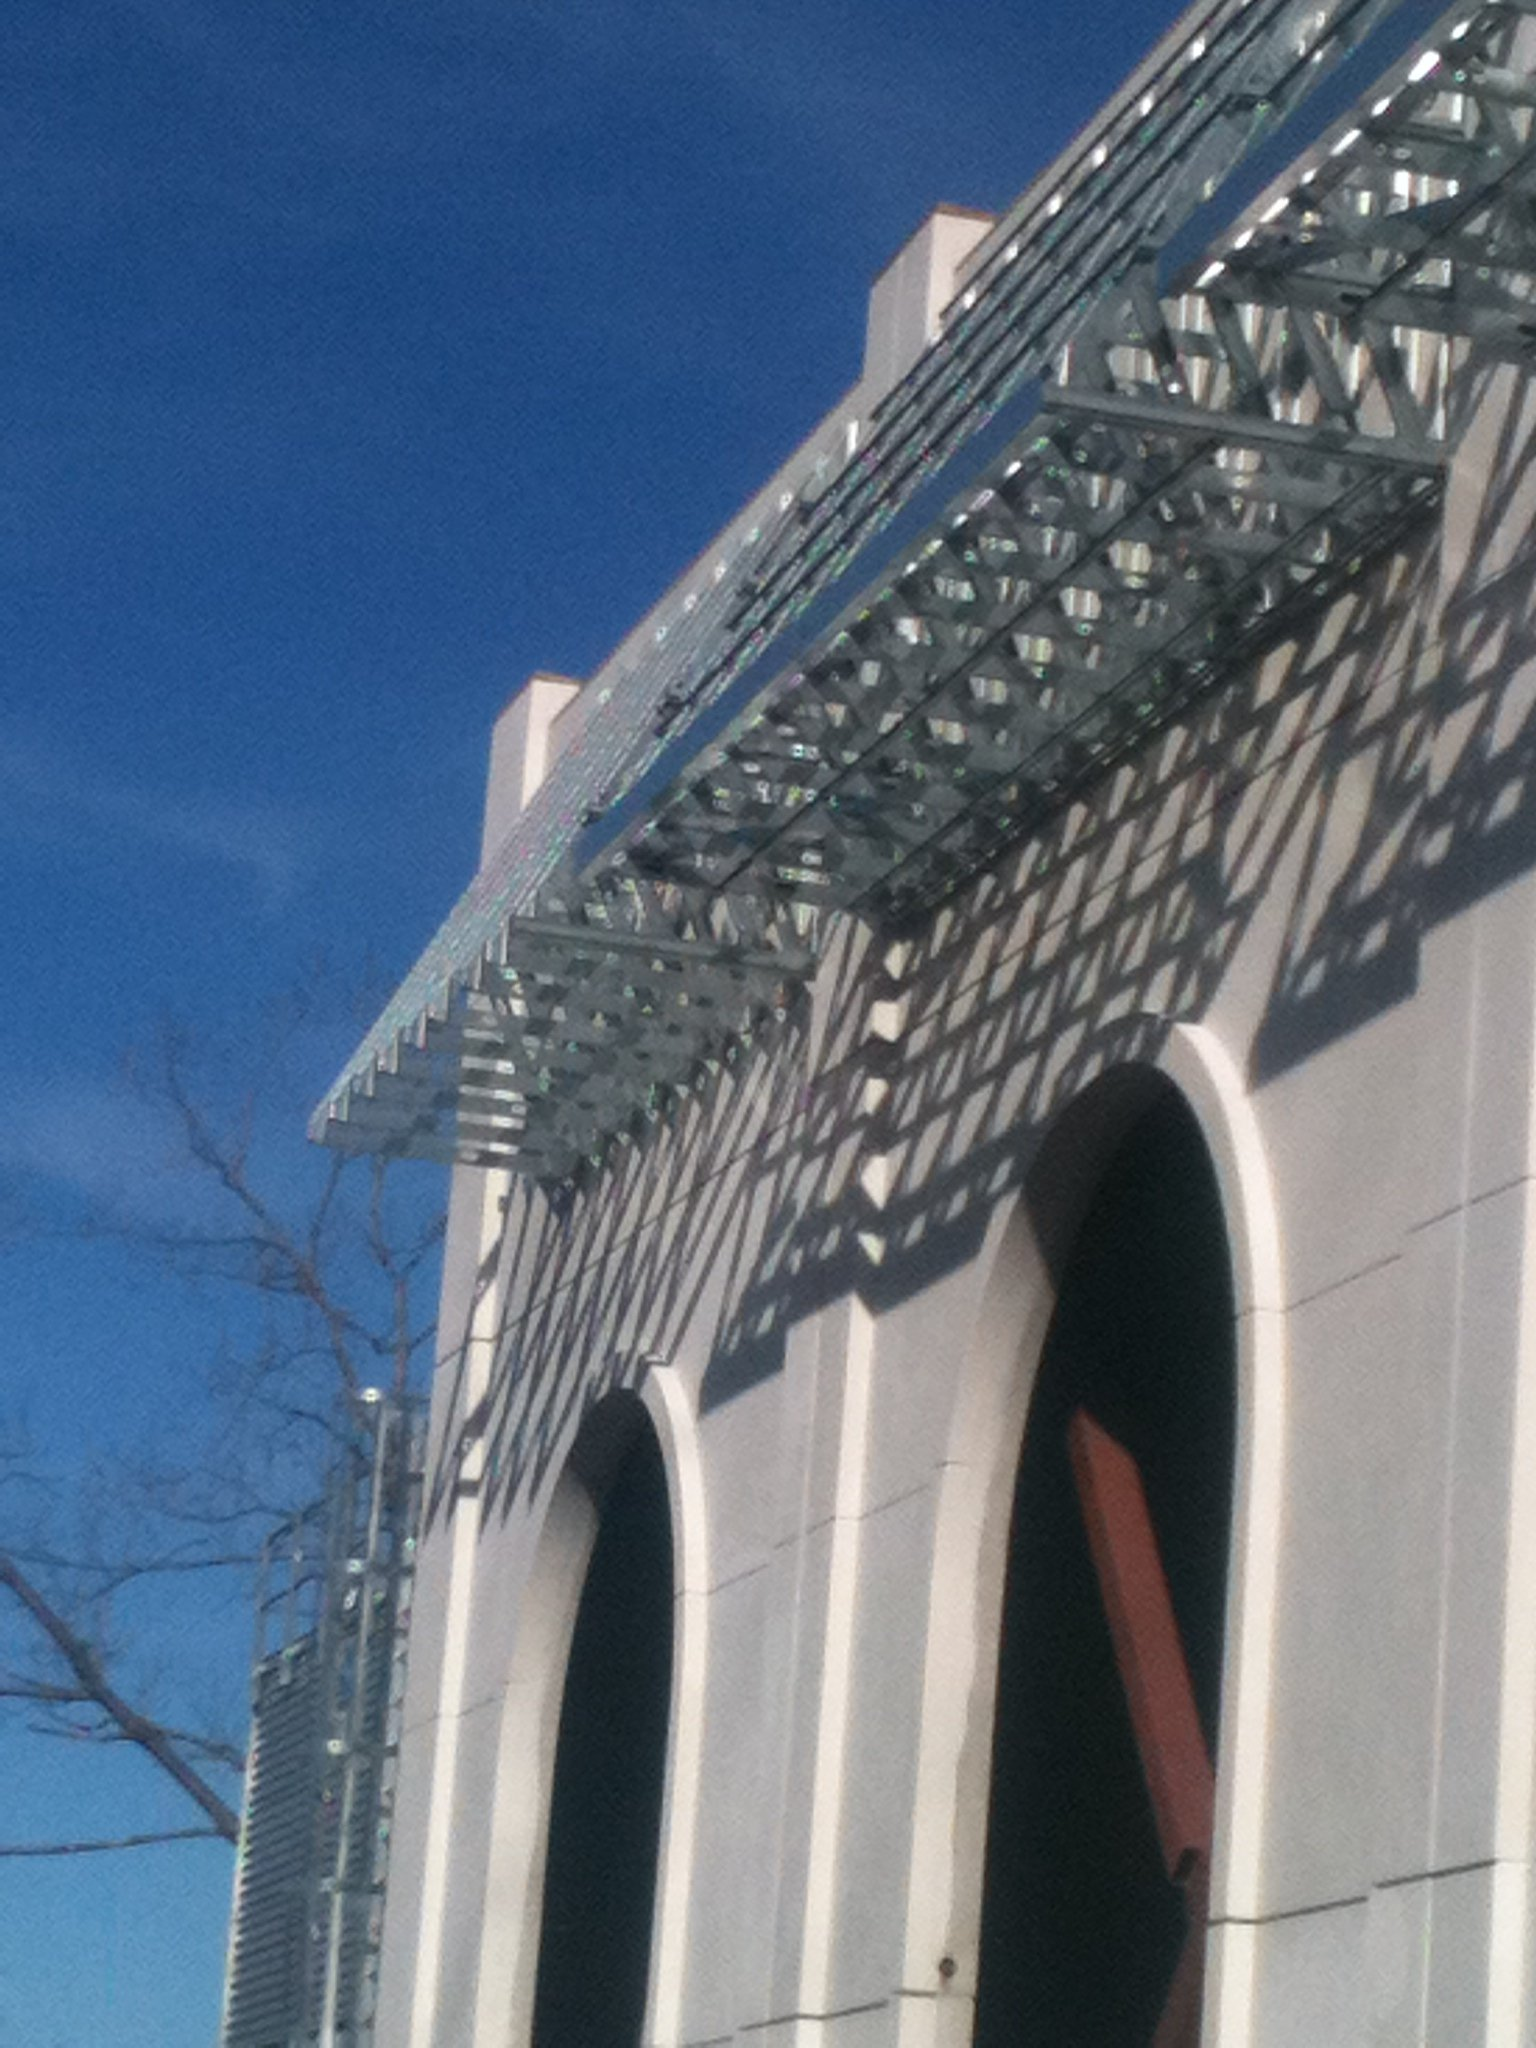 light gauge steel exterior facade